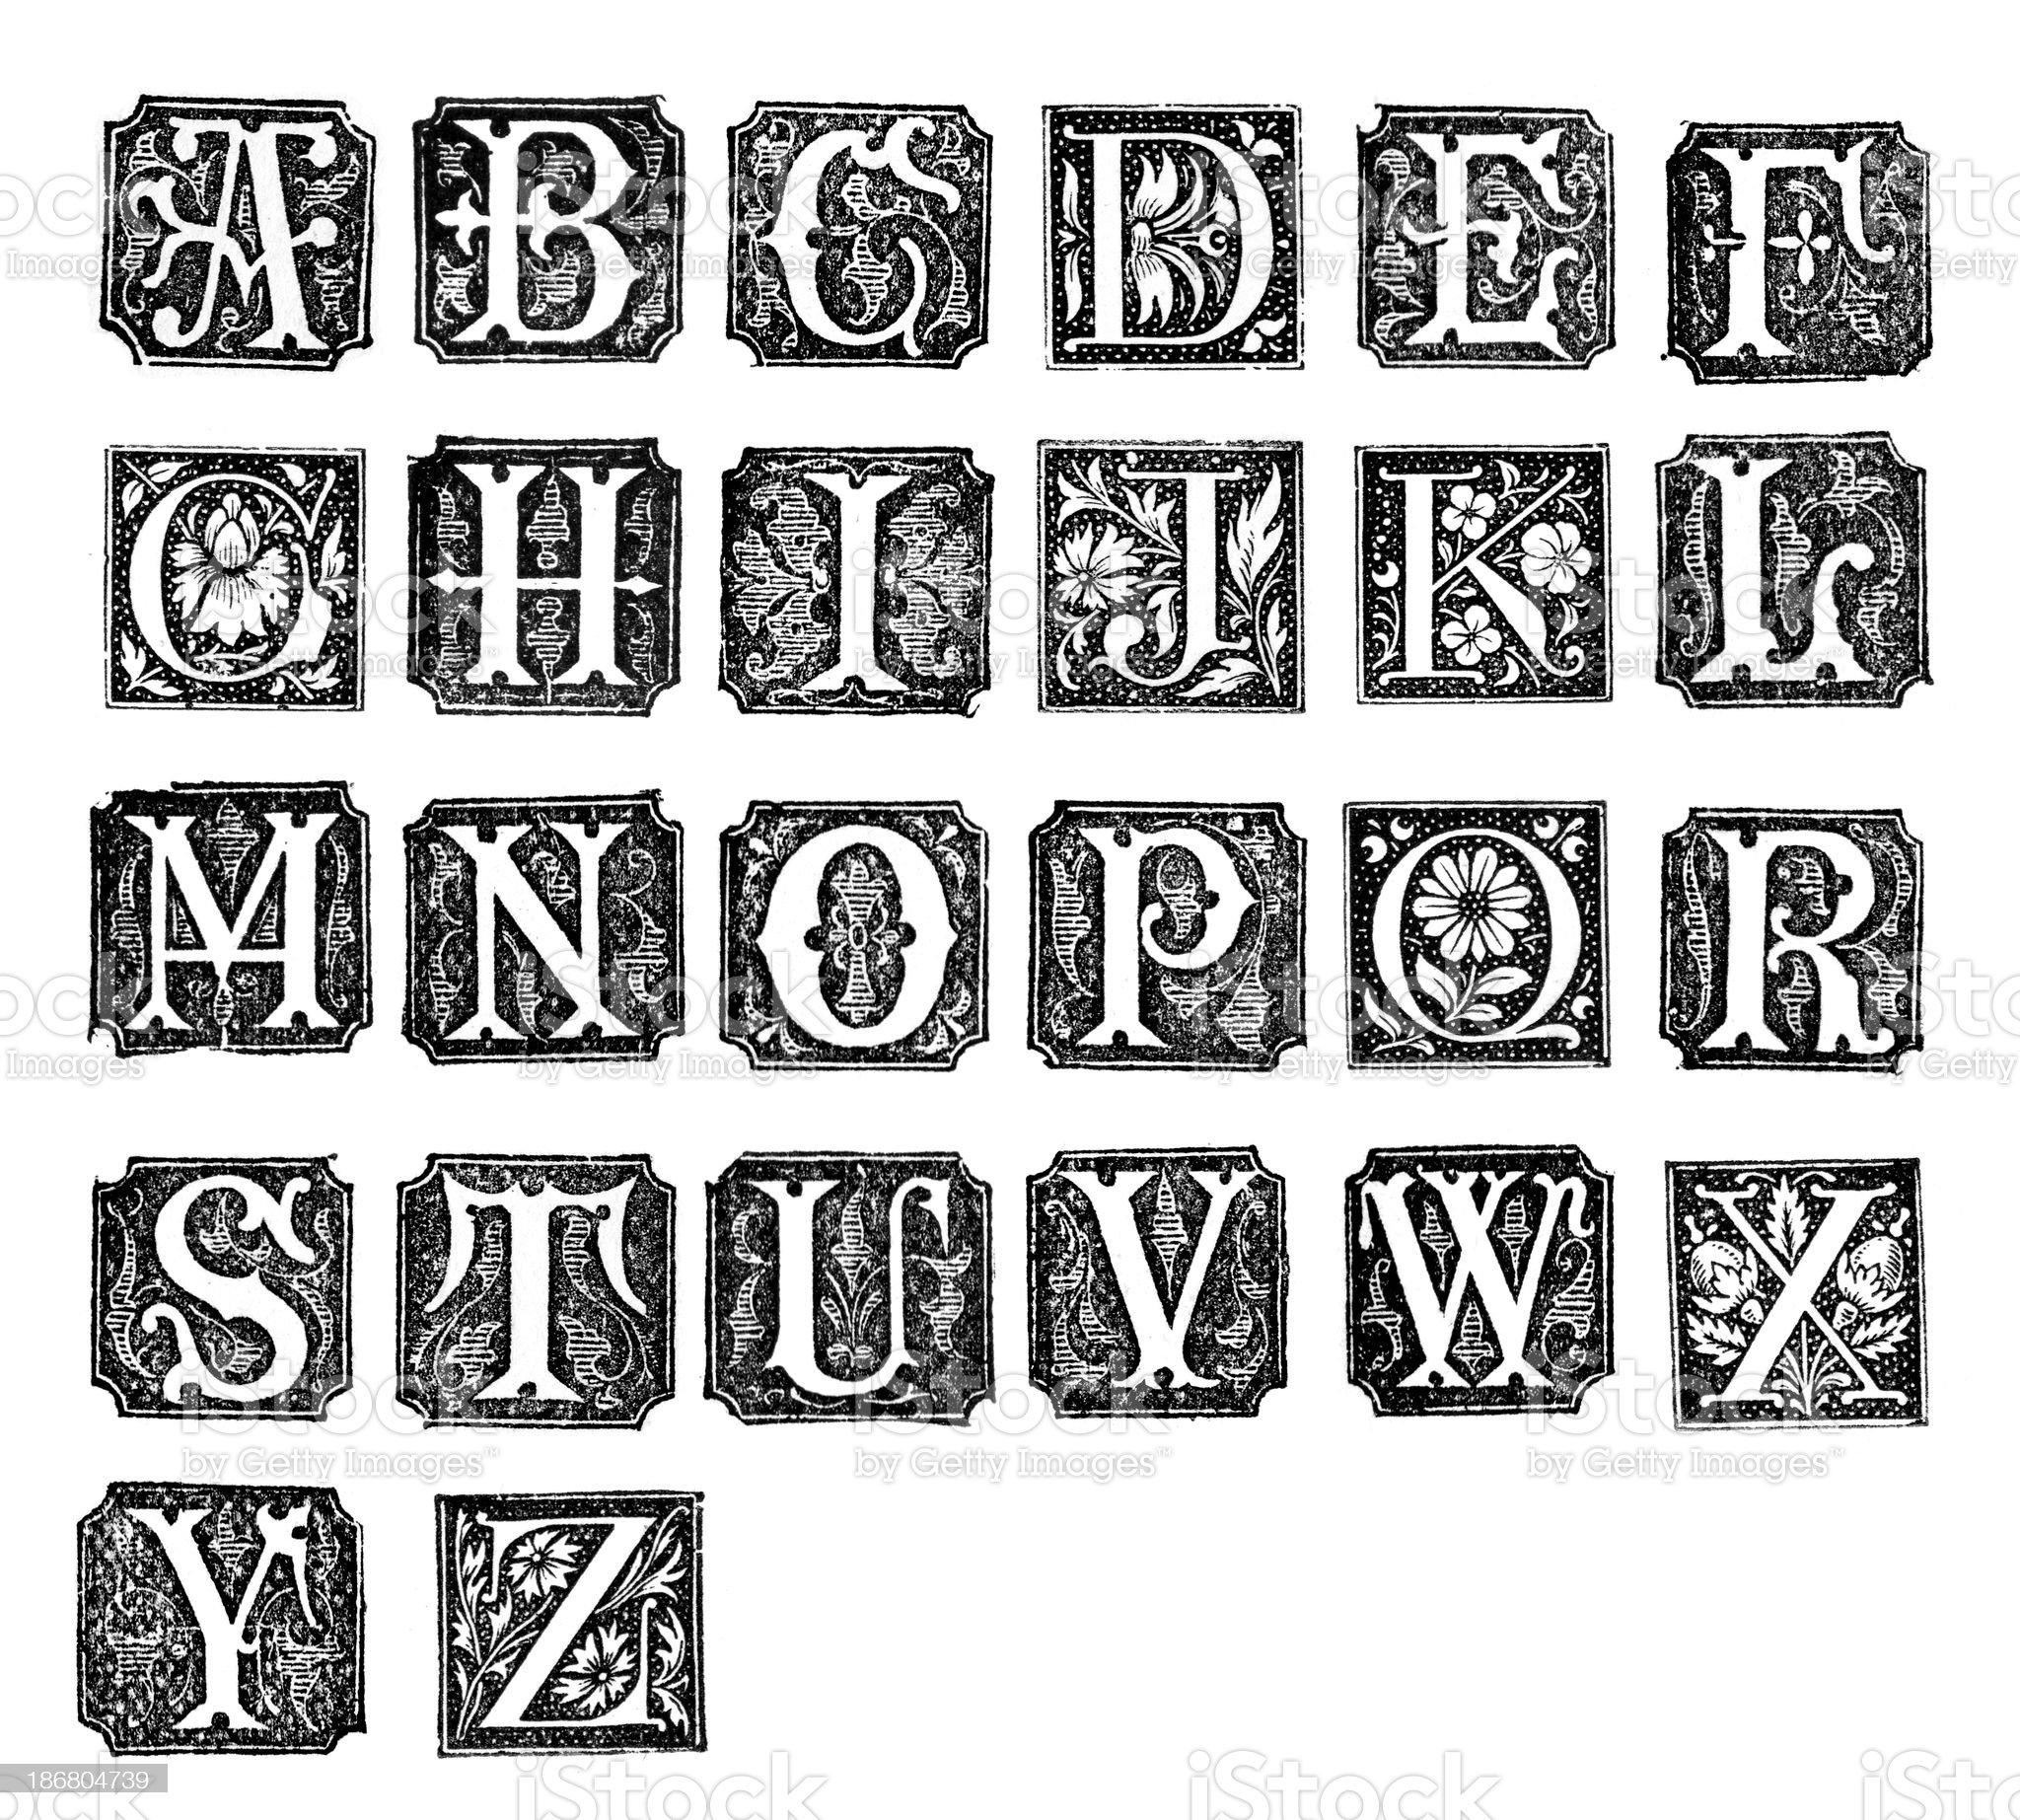 Retro Alphabet Letters royalty-free stock vector art